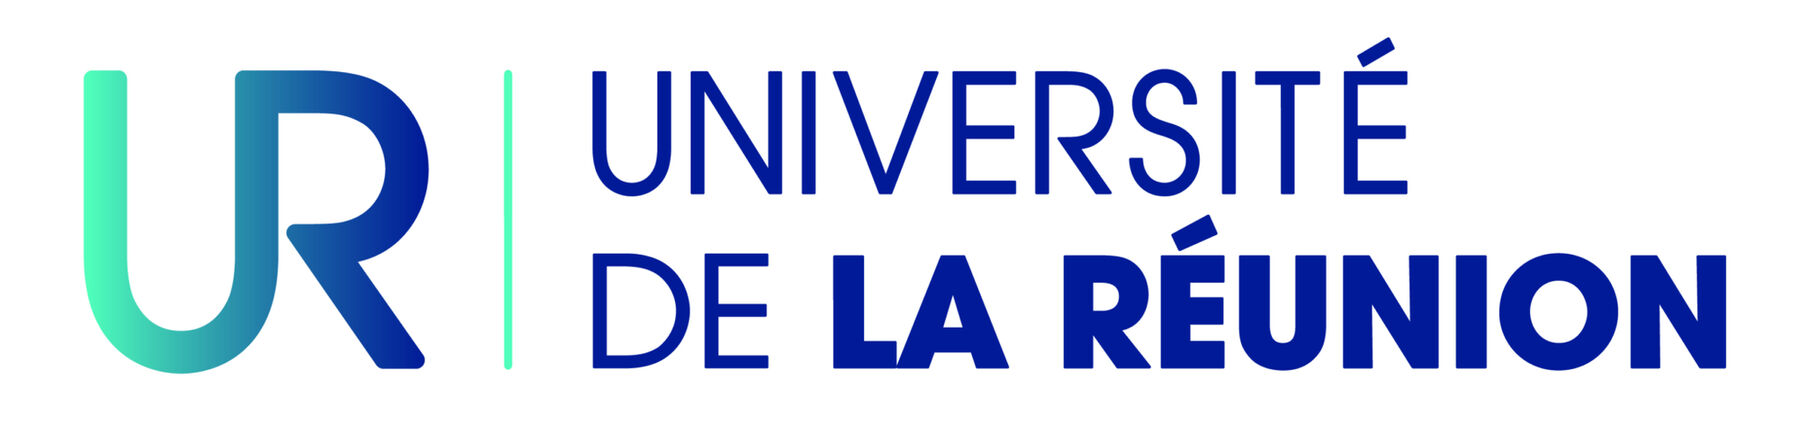 Universite Reunion logo